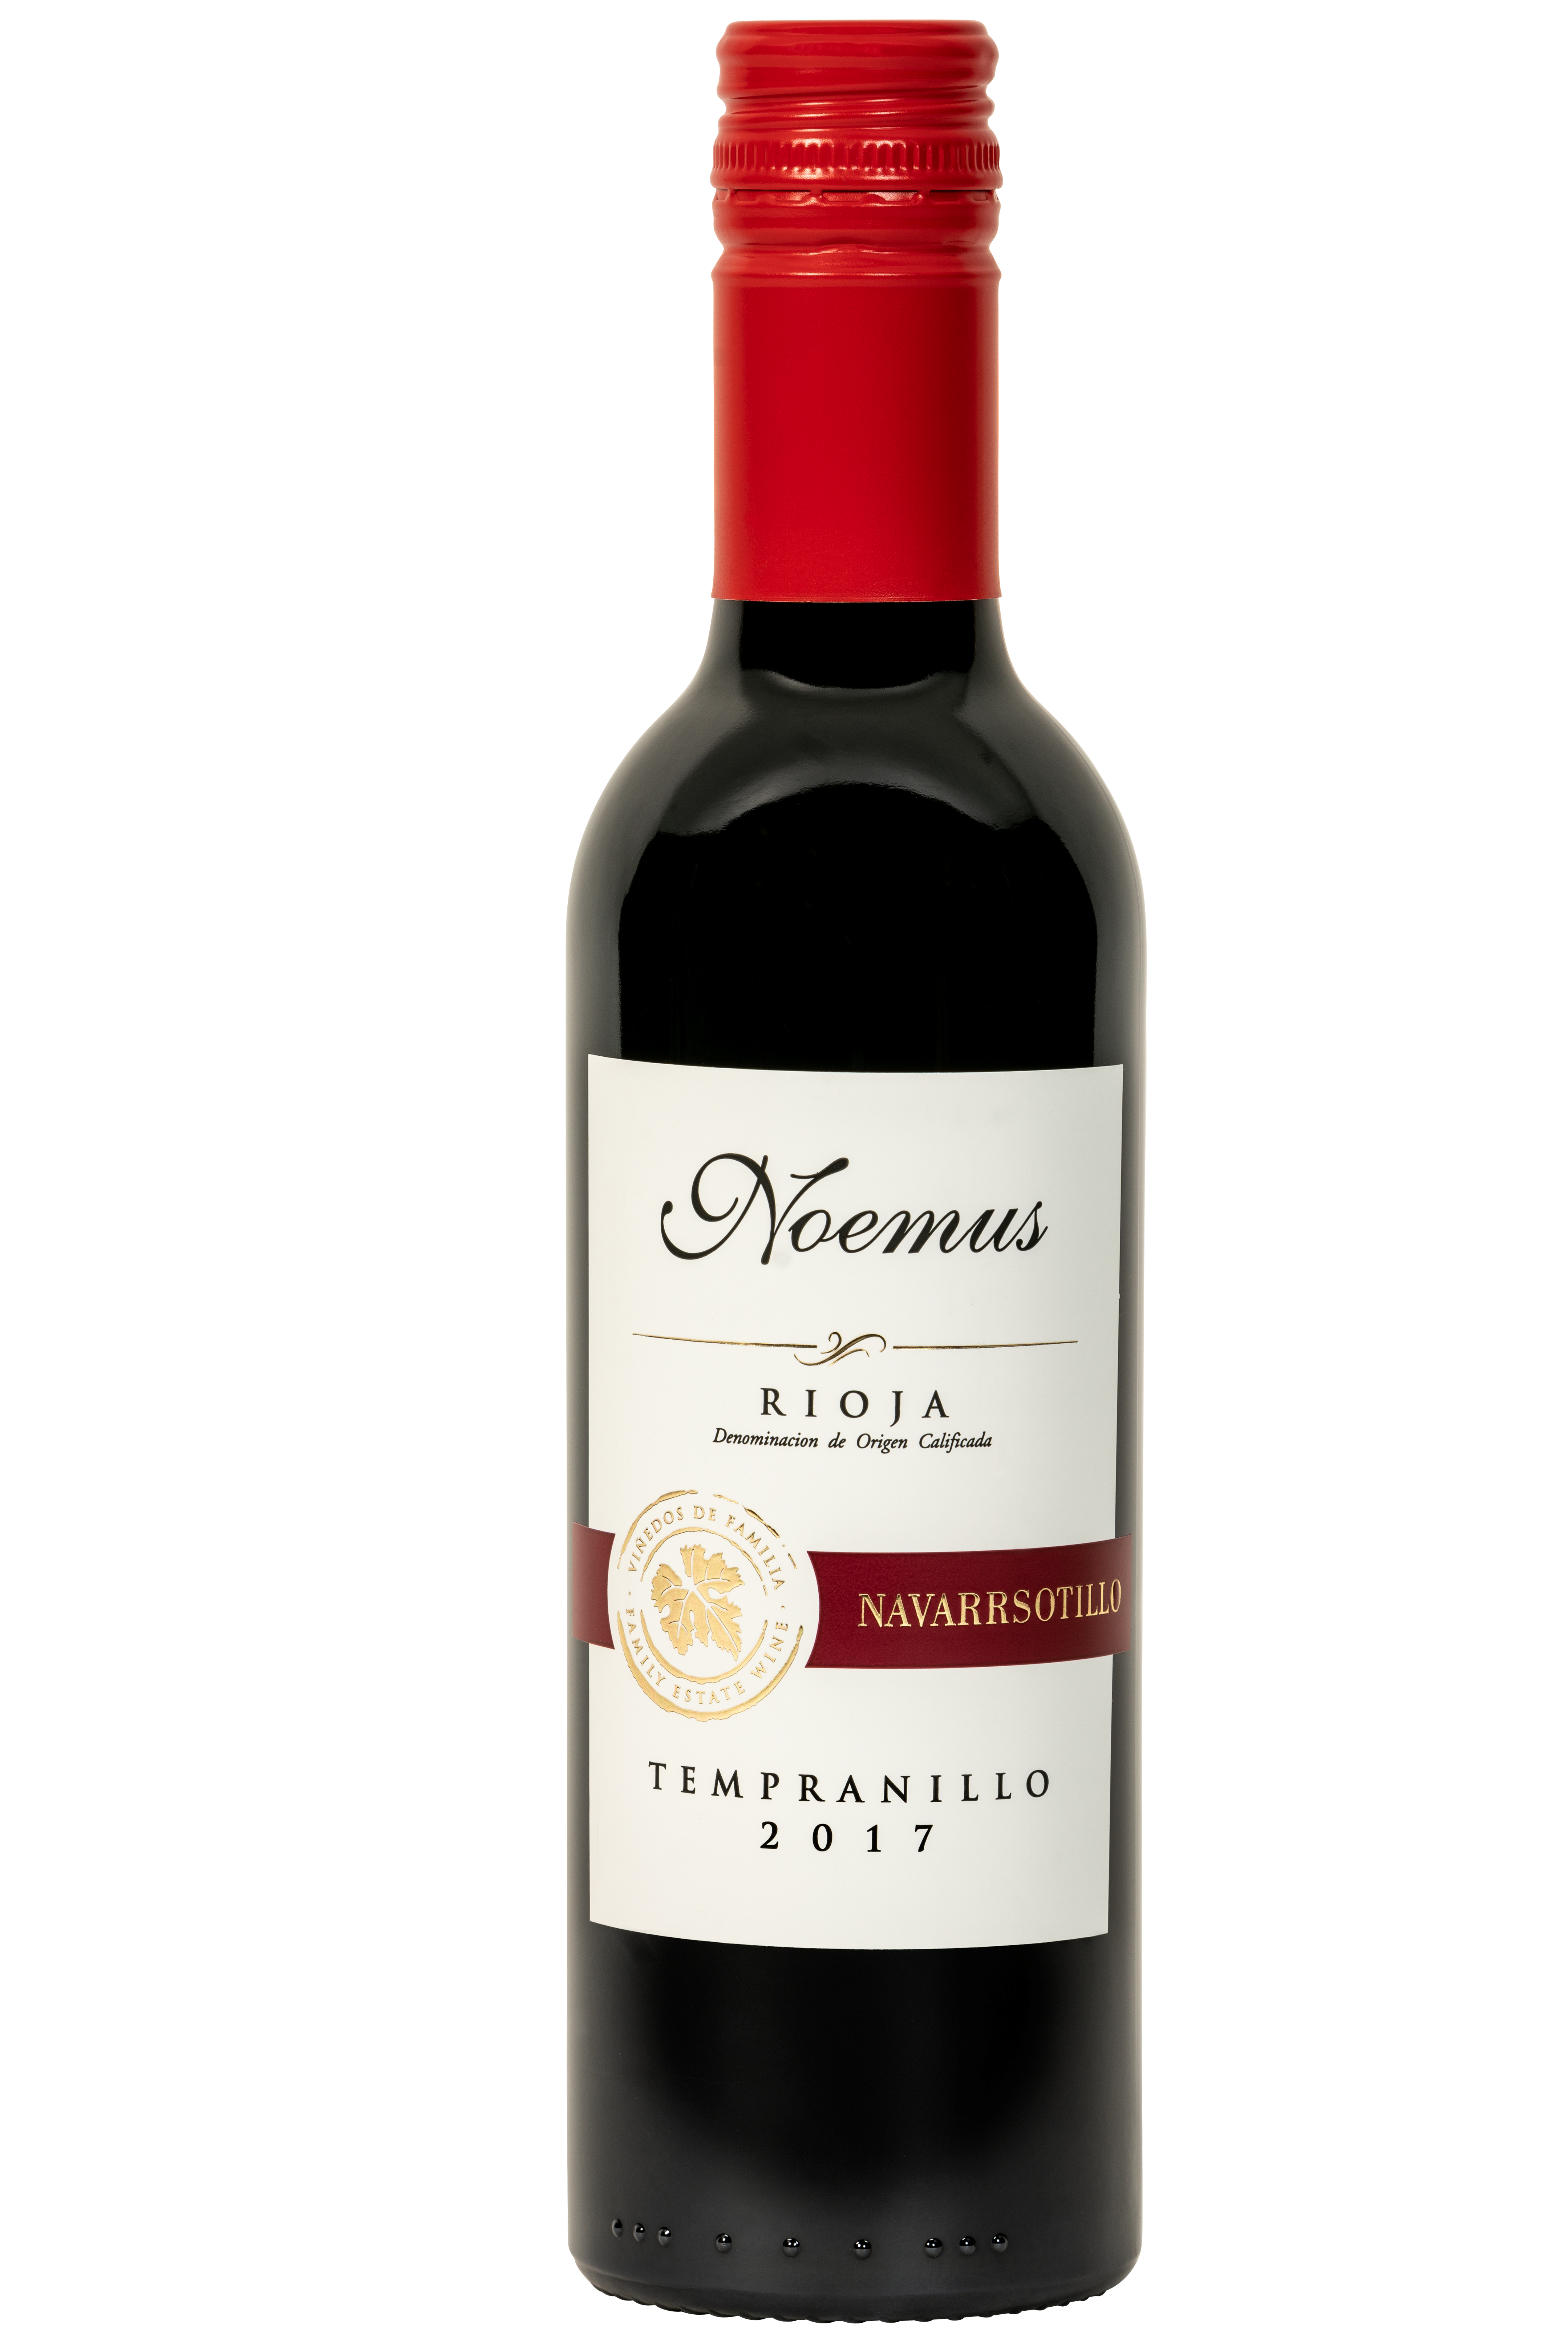 Klein flesje 37,5cl zachte rode wijn Spanje Rioja biologisch vegan tempranillo